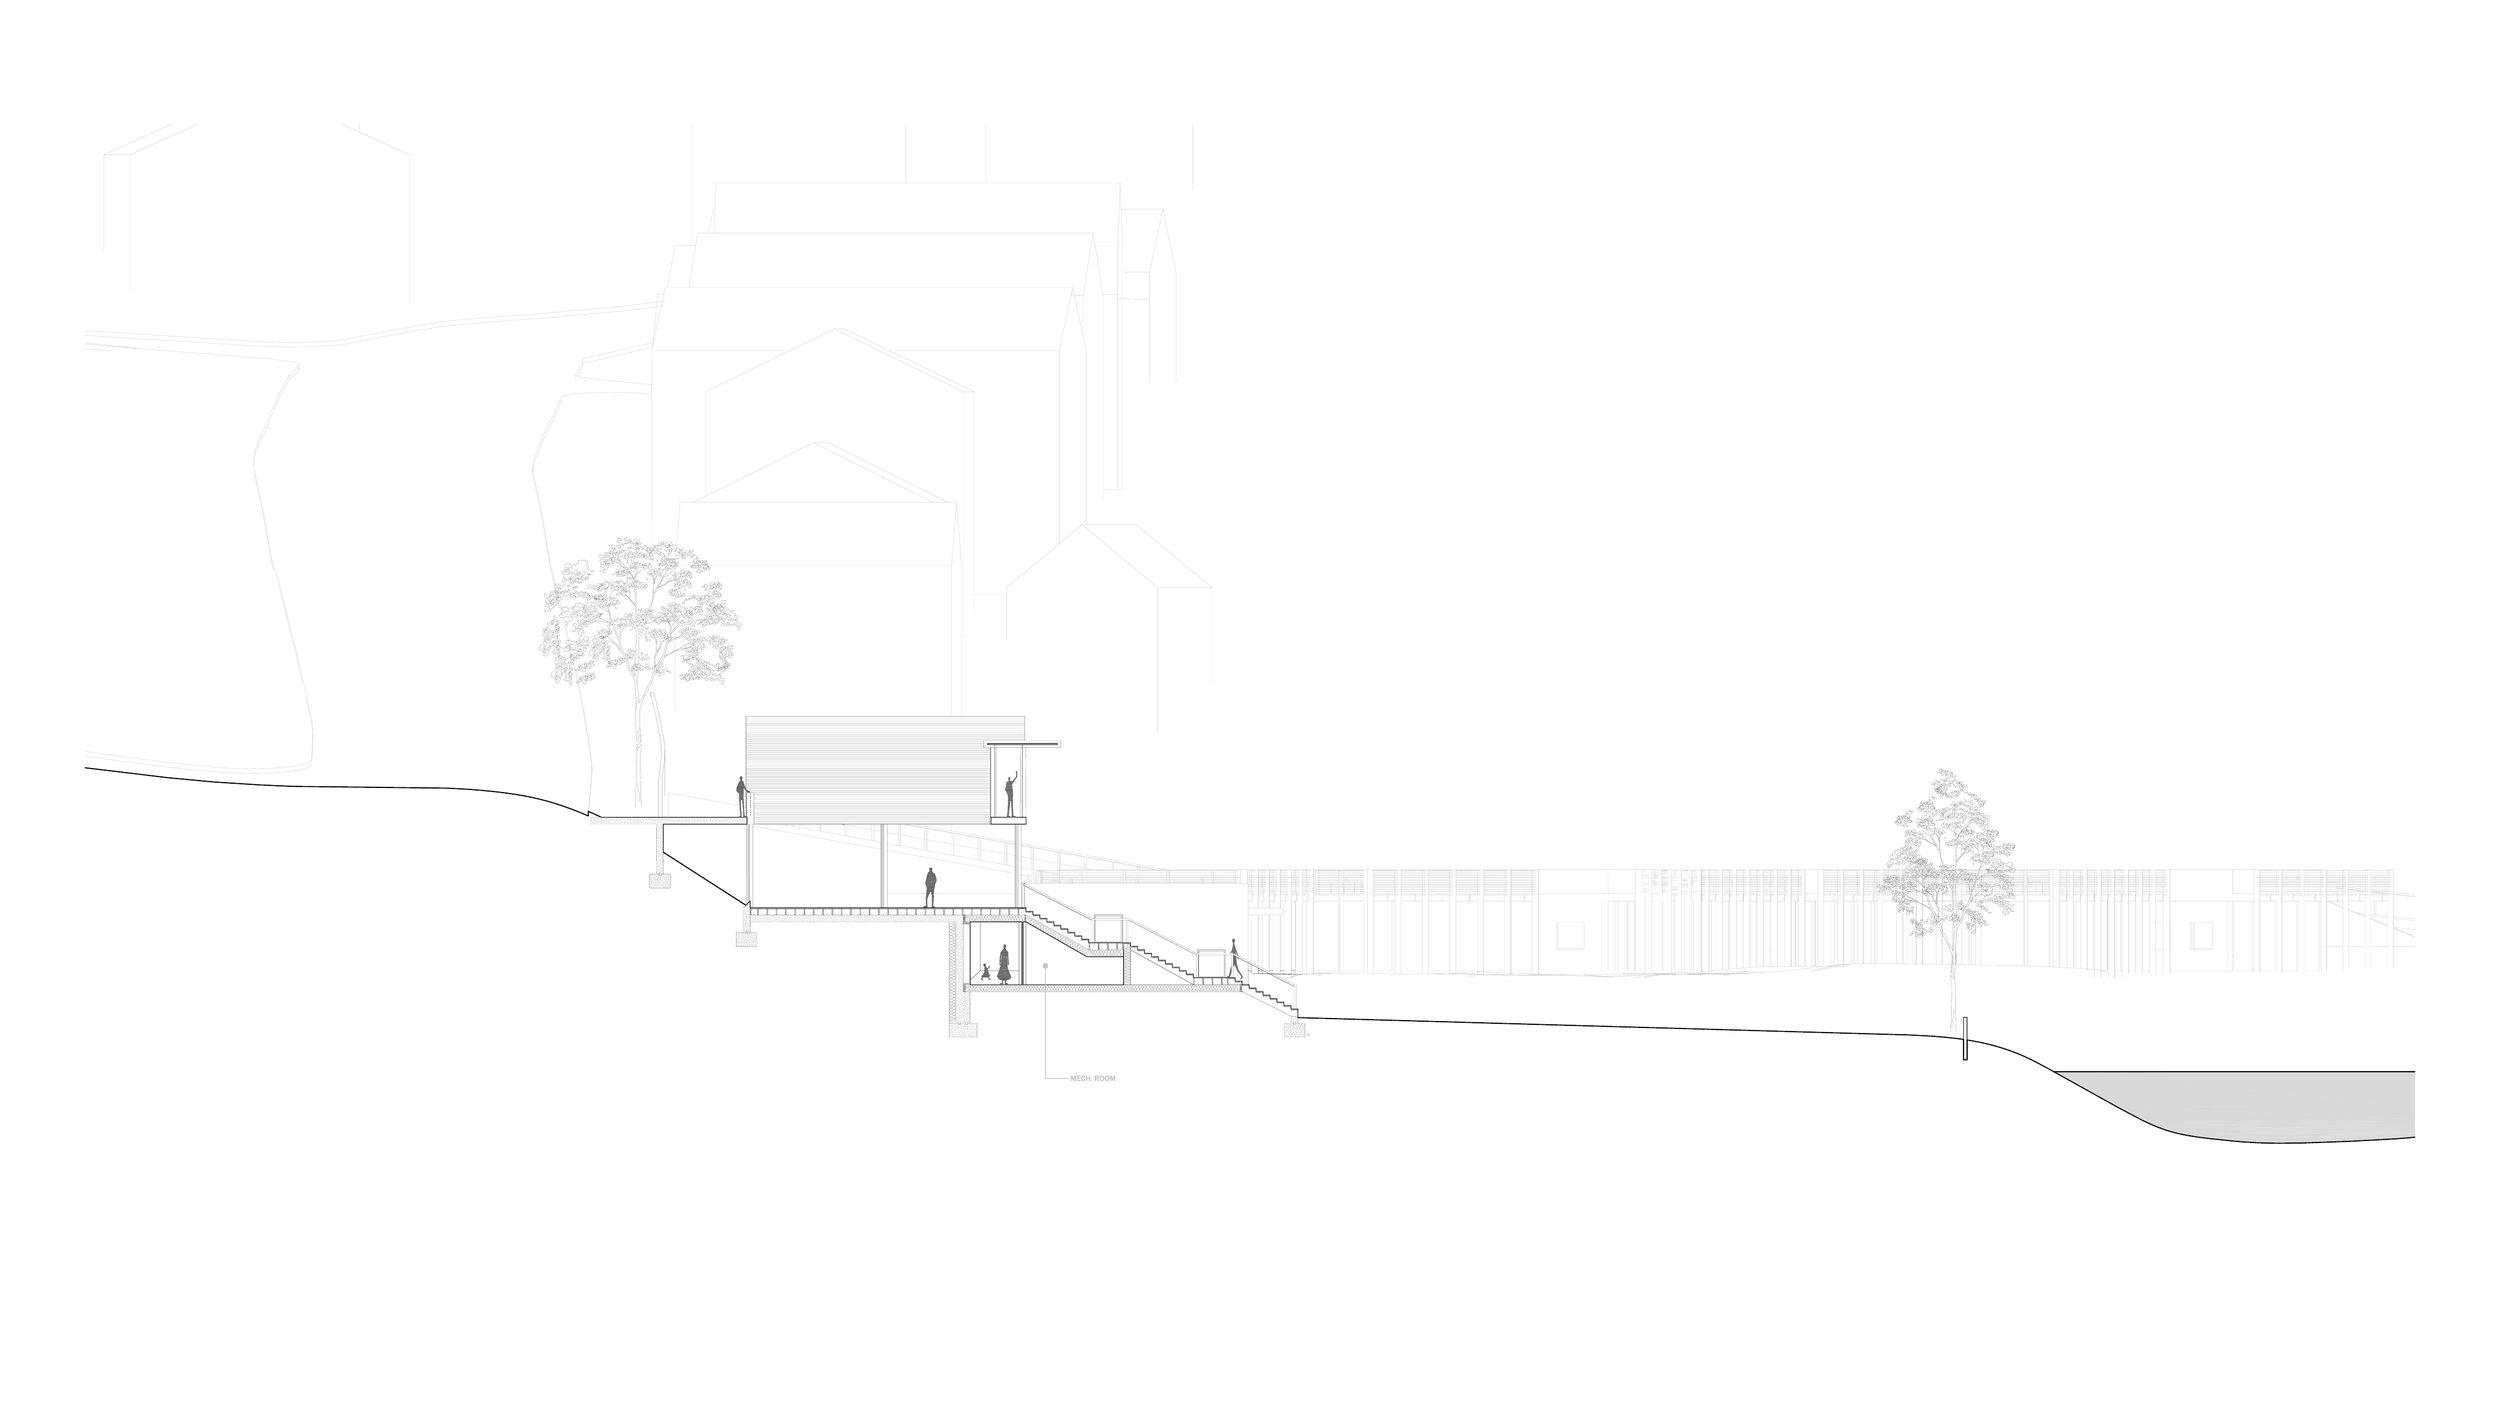 Design IV Fomrated22.jpg